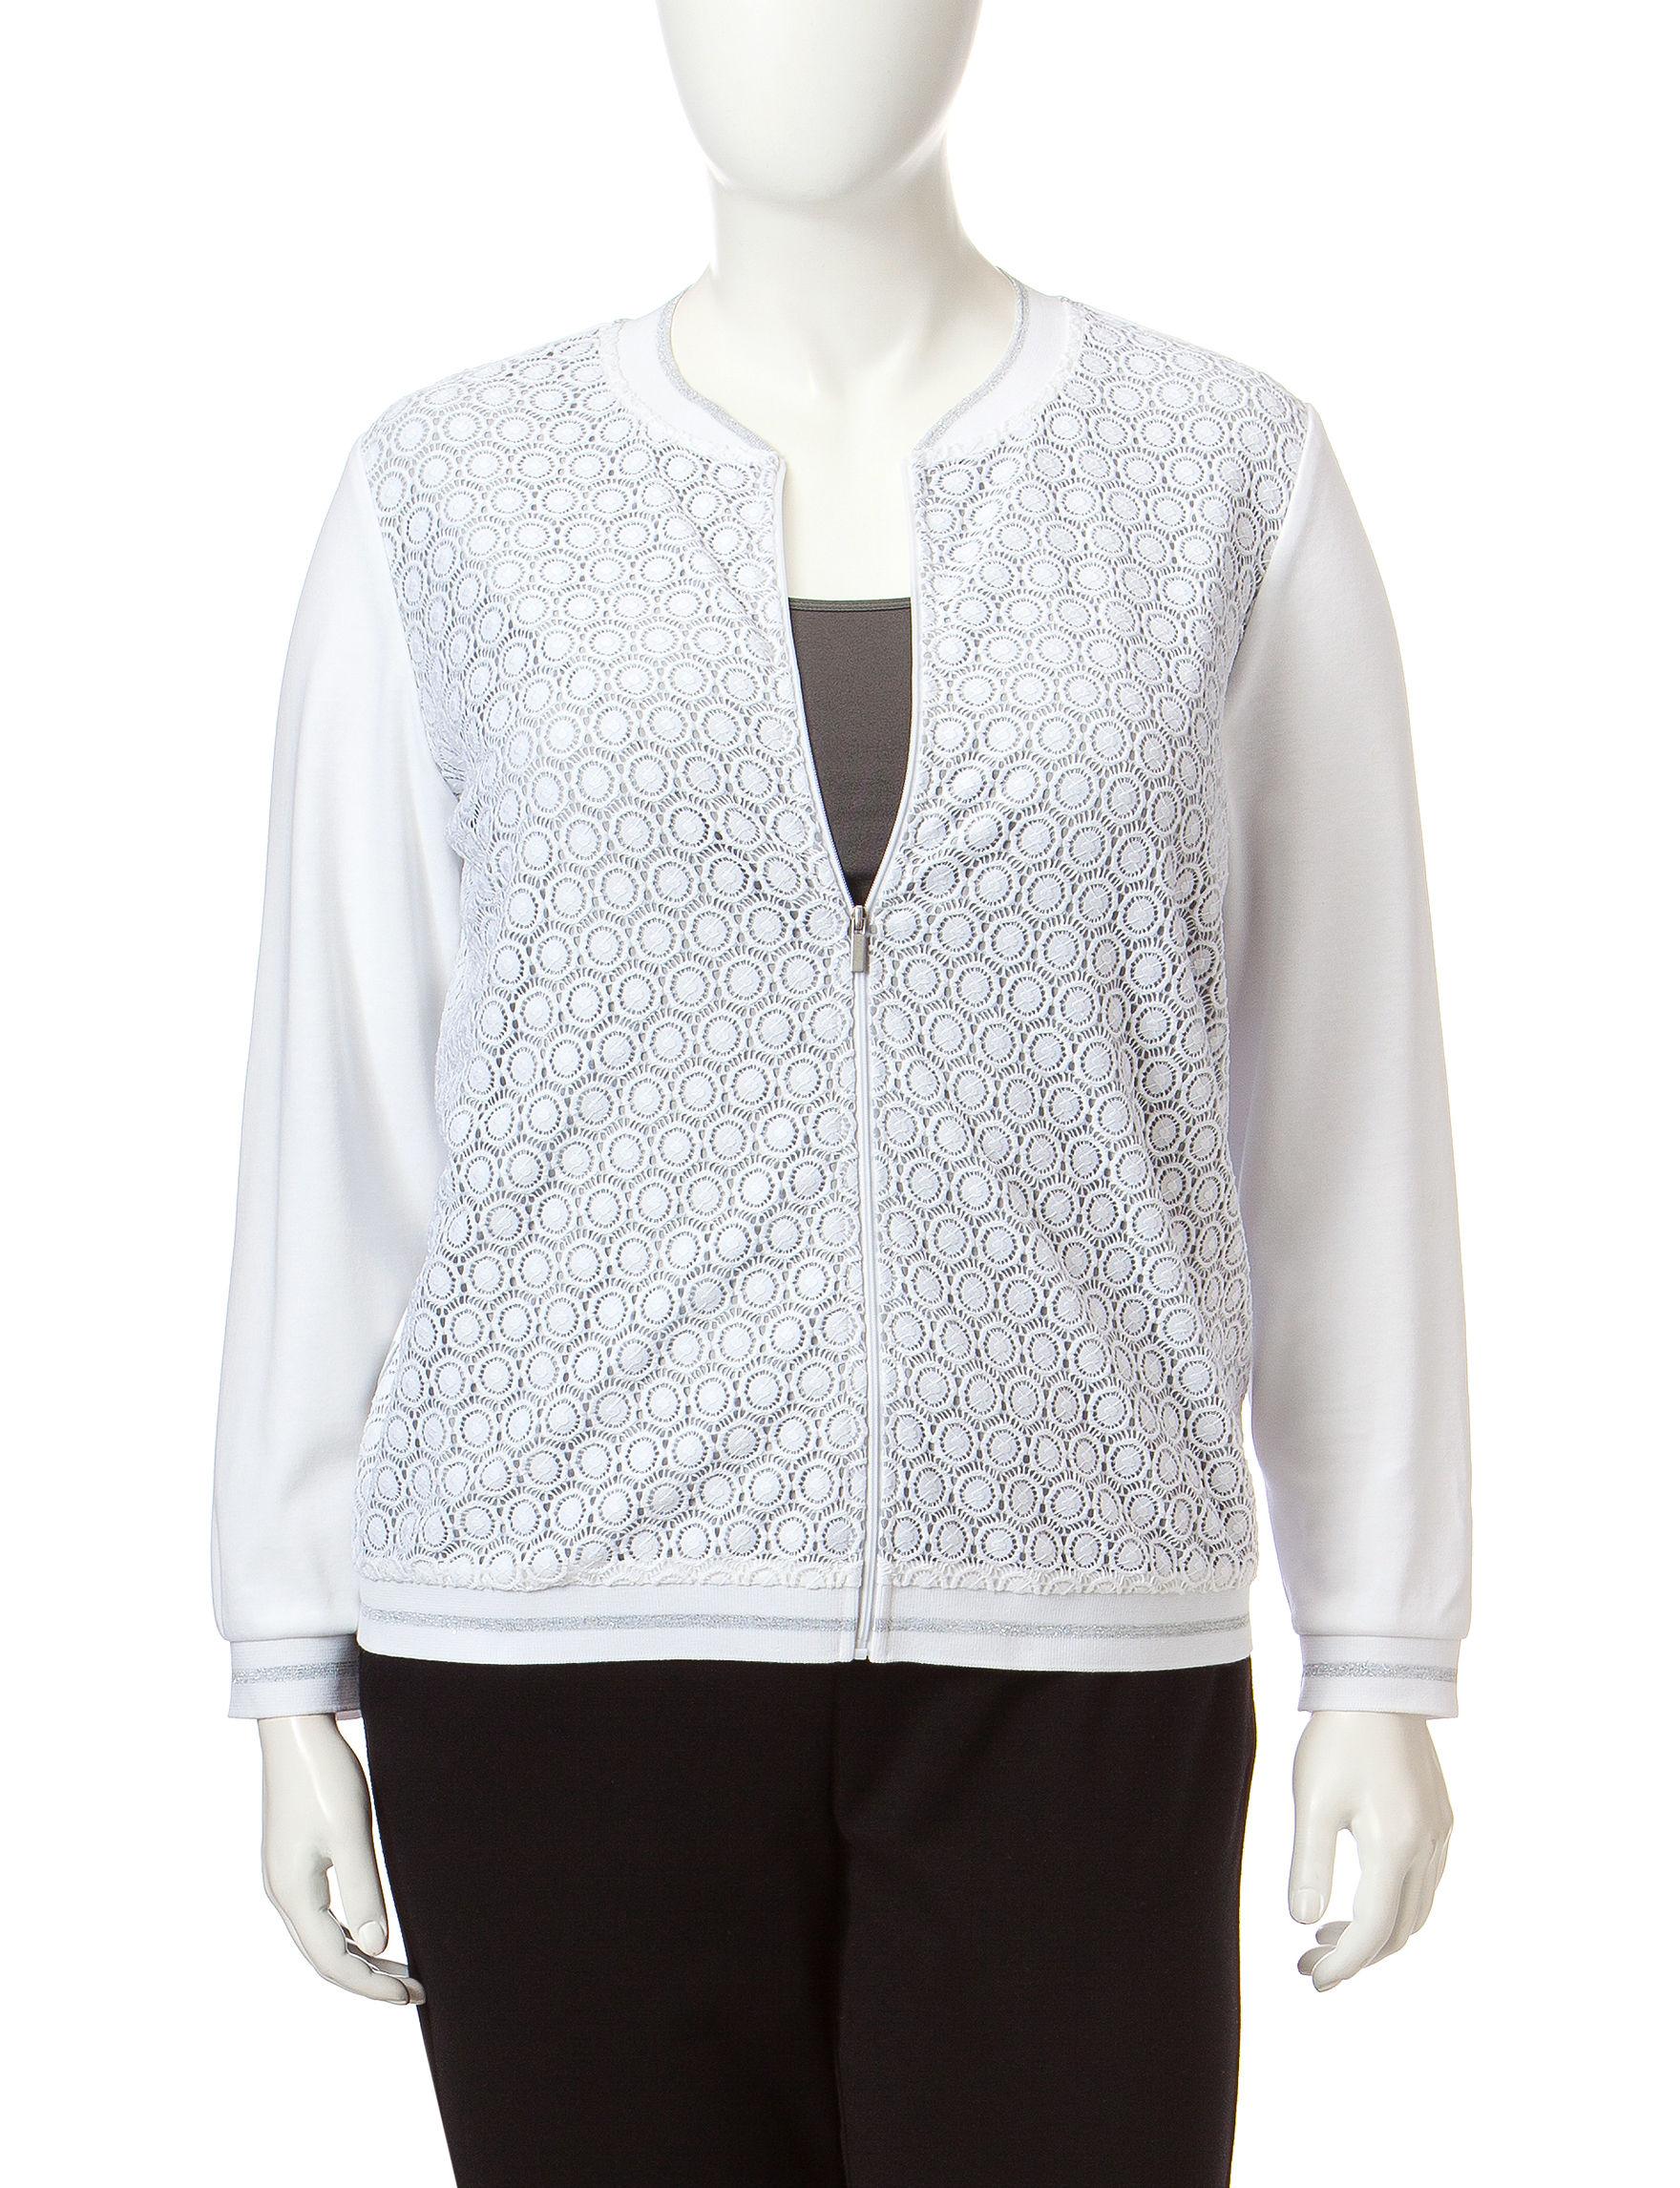 Alfred Dunner White / Grey Lightweight Jackets & Blazers